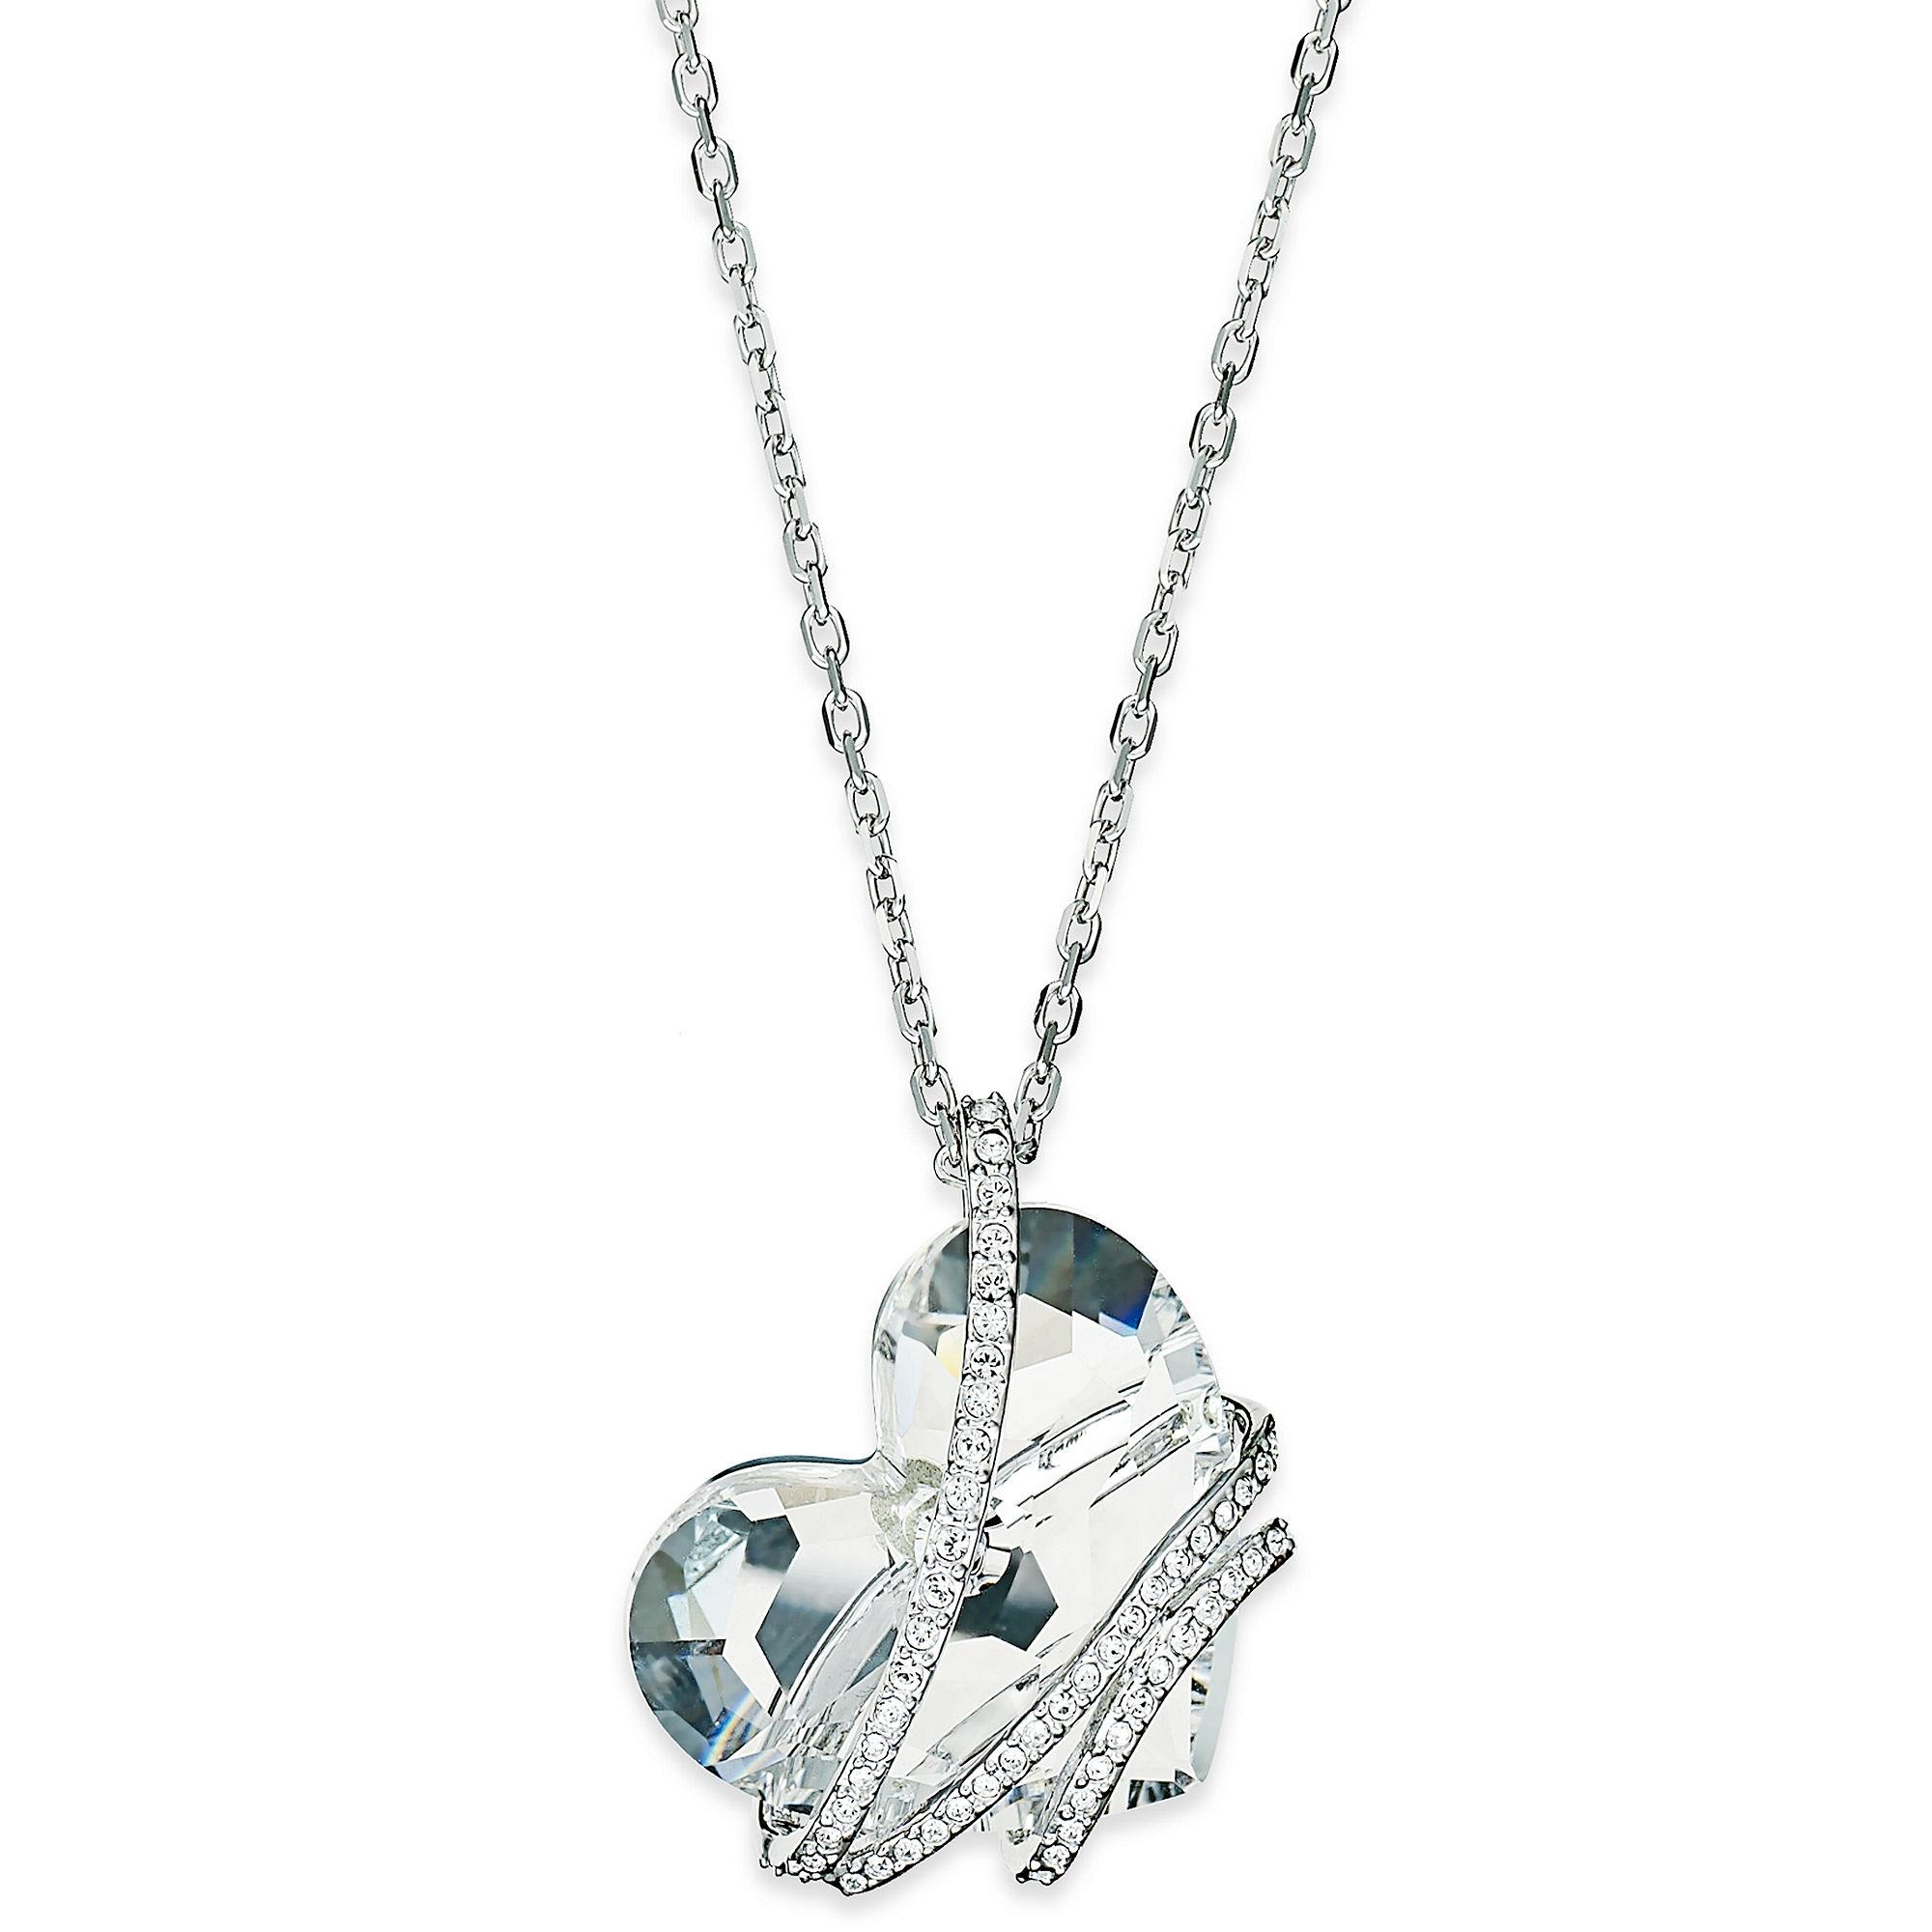 swarovski silver tone crystal heart pendant necklace in. Black Bedroom Furniture Sets. Home Design Ideas